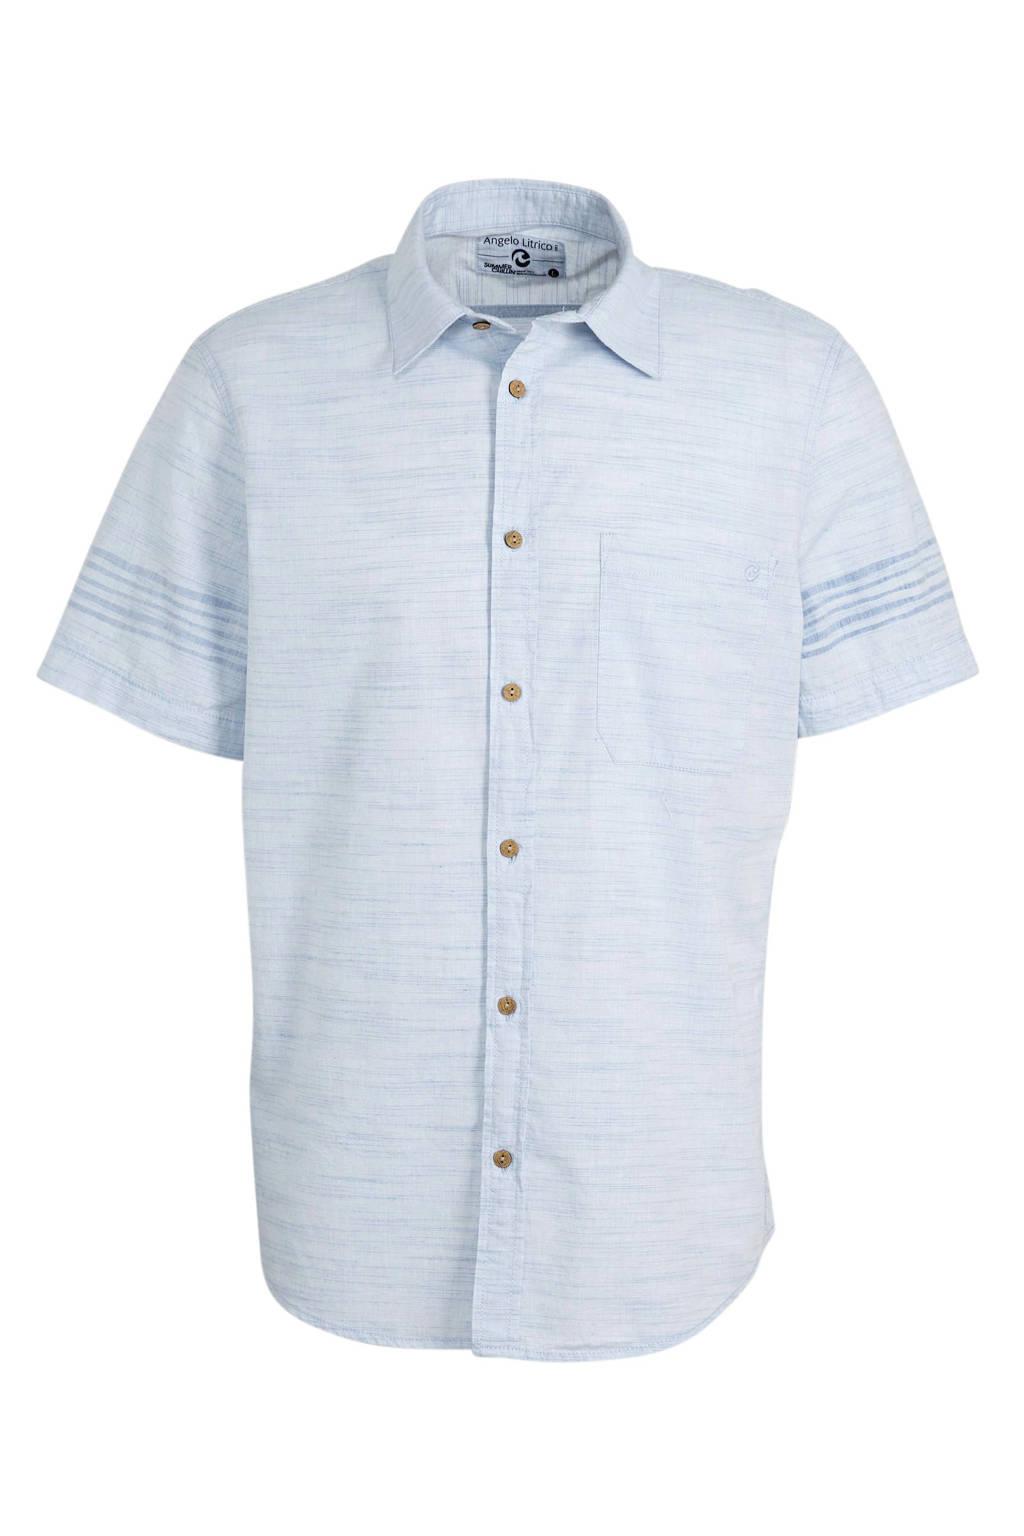 C&A Angelo Litrico gemêleerd regular fit overhemd van biologisch katoen lichtblauw, Lichtblauw